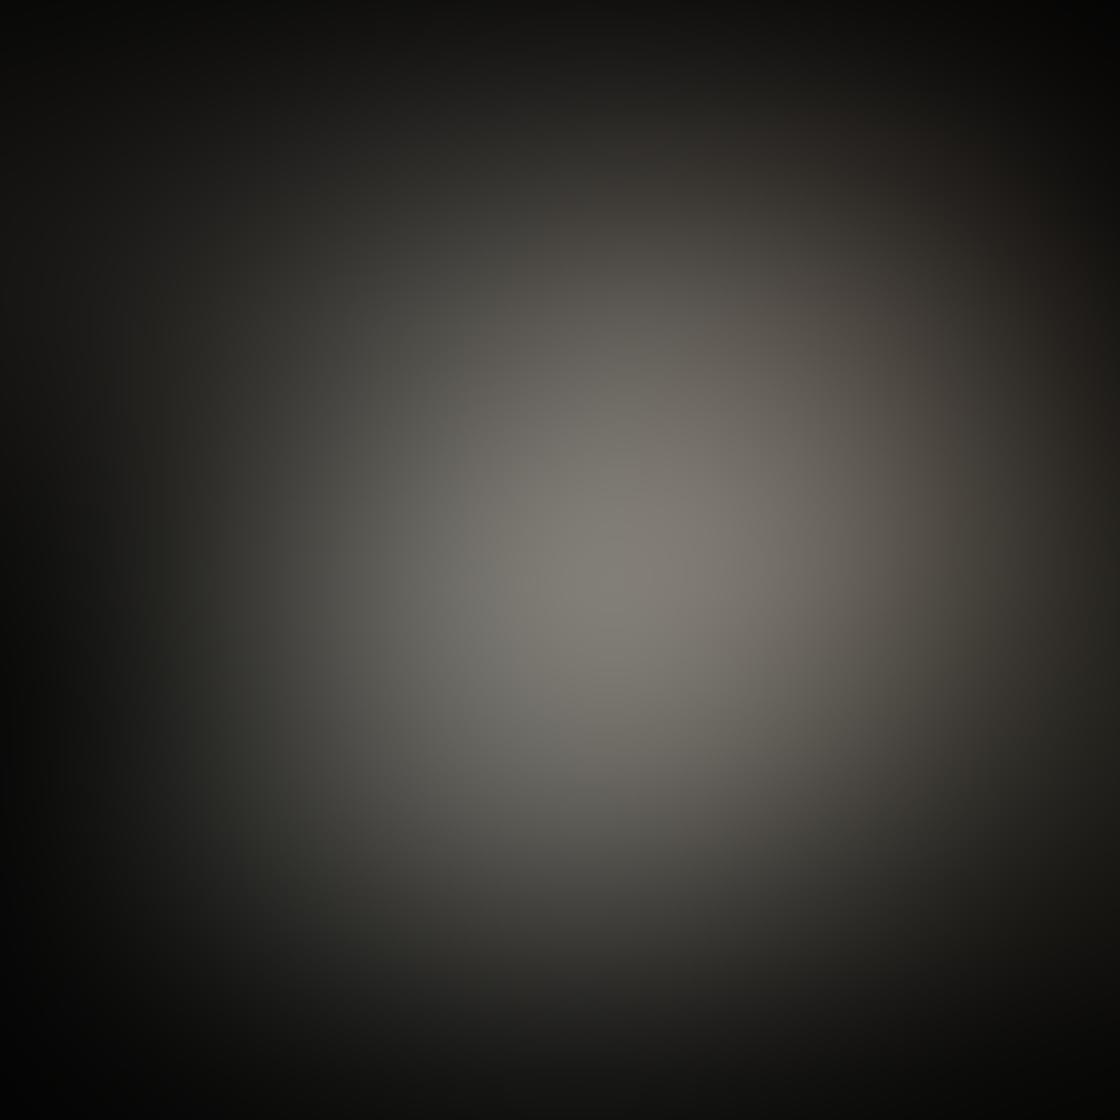 Shadow iPhone Photos 17